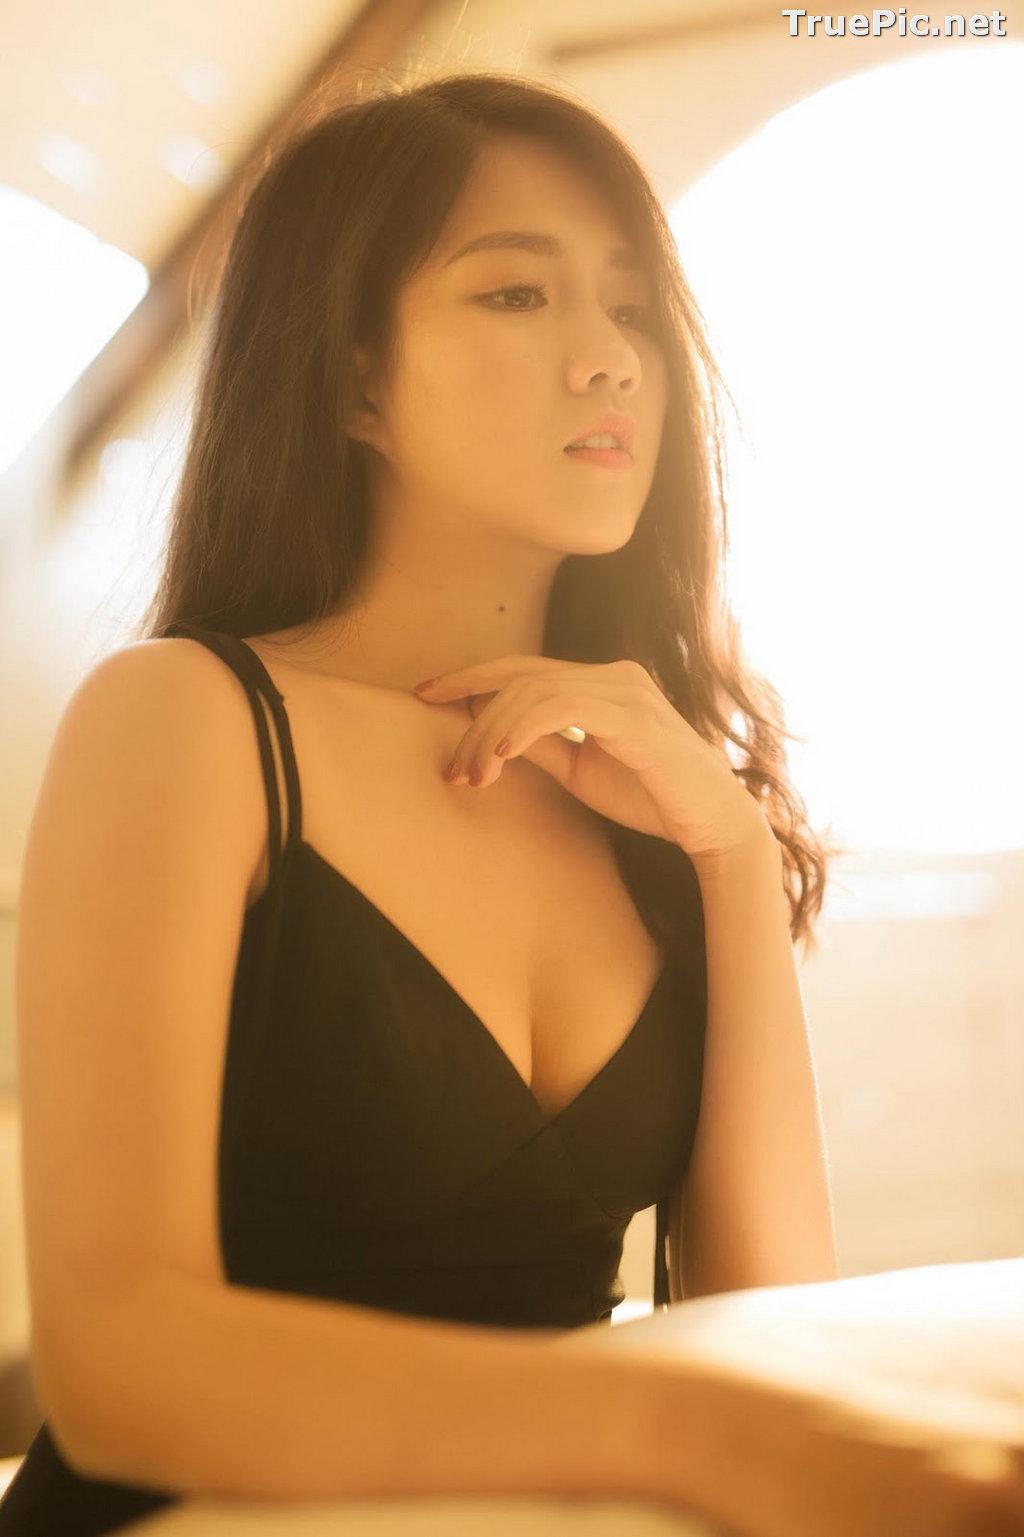 Image Vietnamese Hot Girl - Nguyen Hoang Kieu Trinh - My Black Angel - TruePic.net - Picture-27